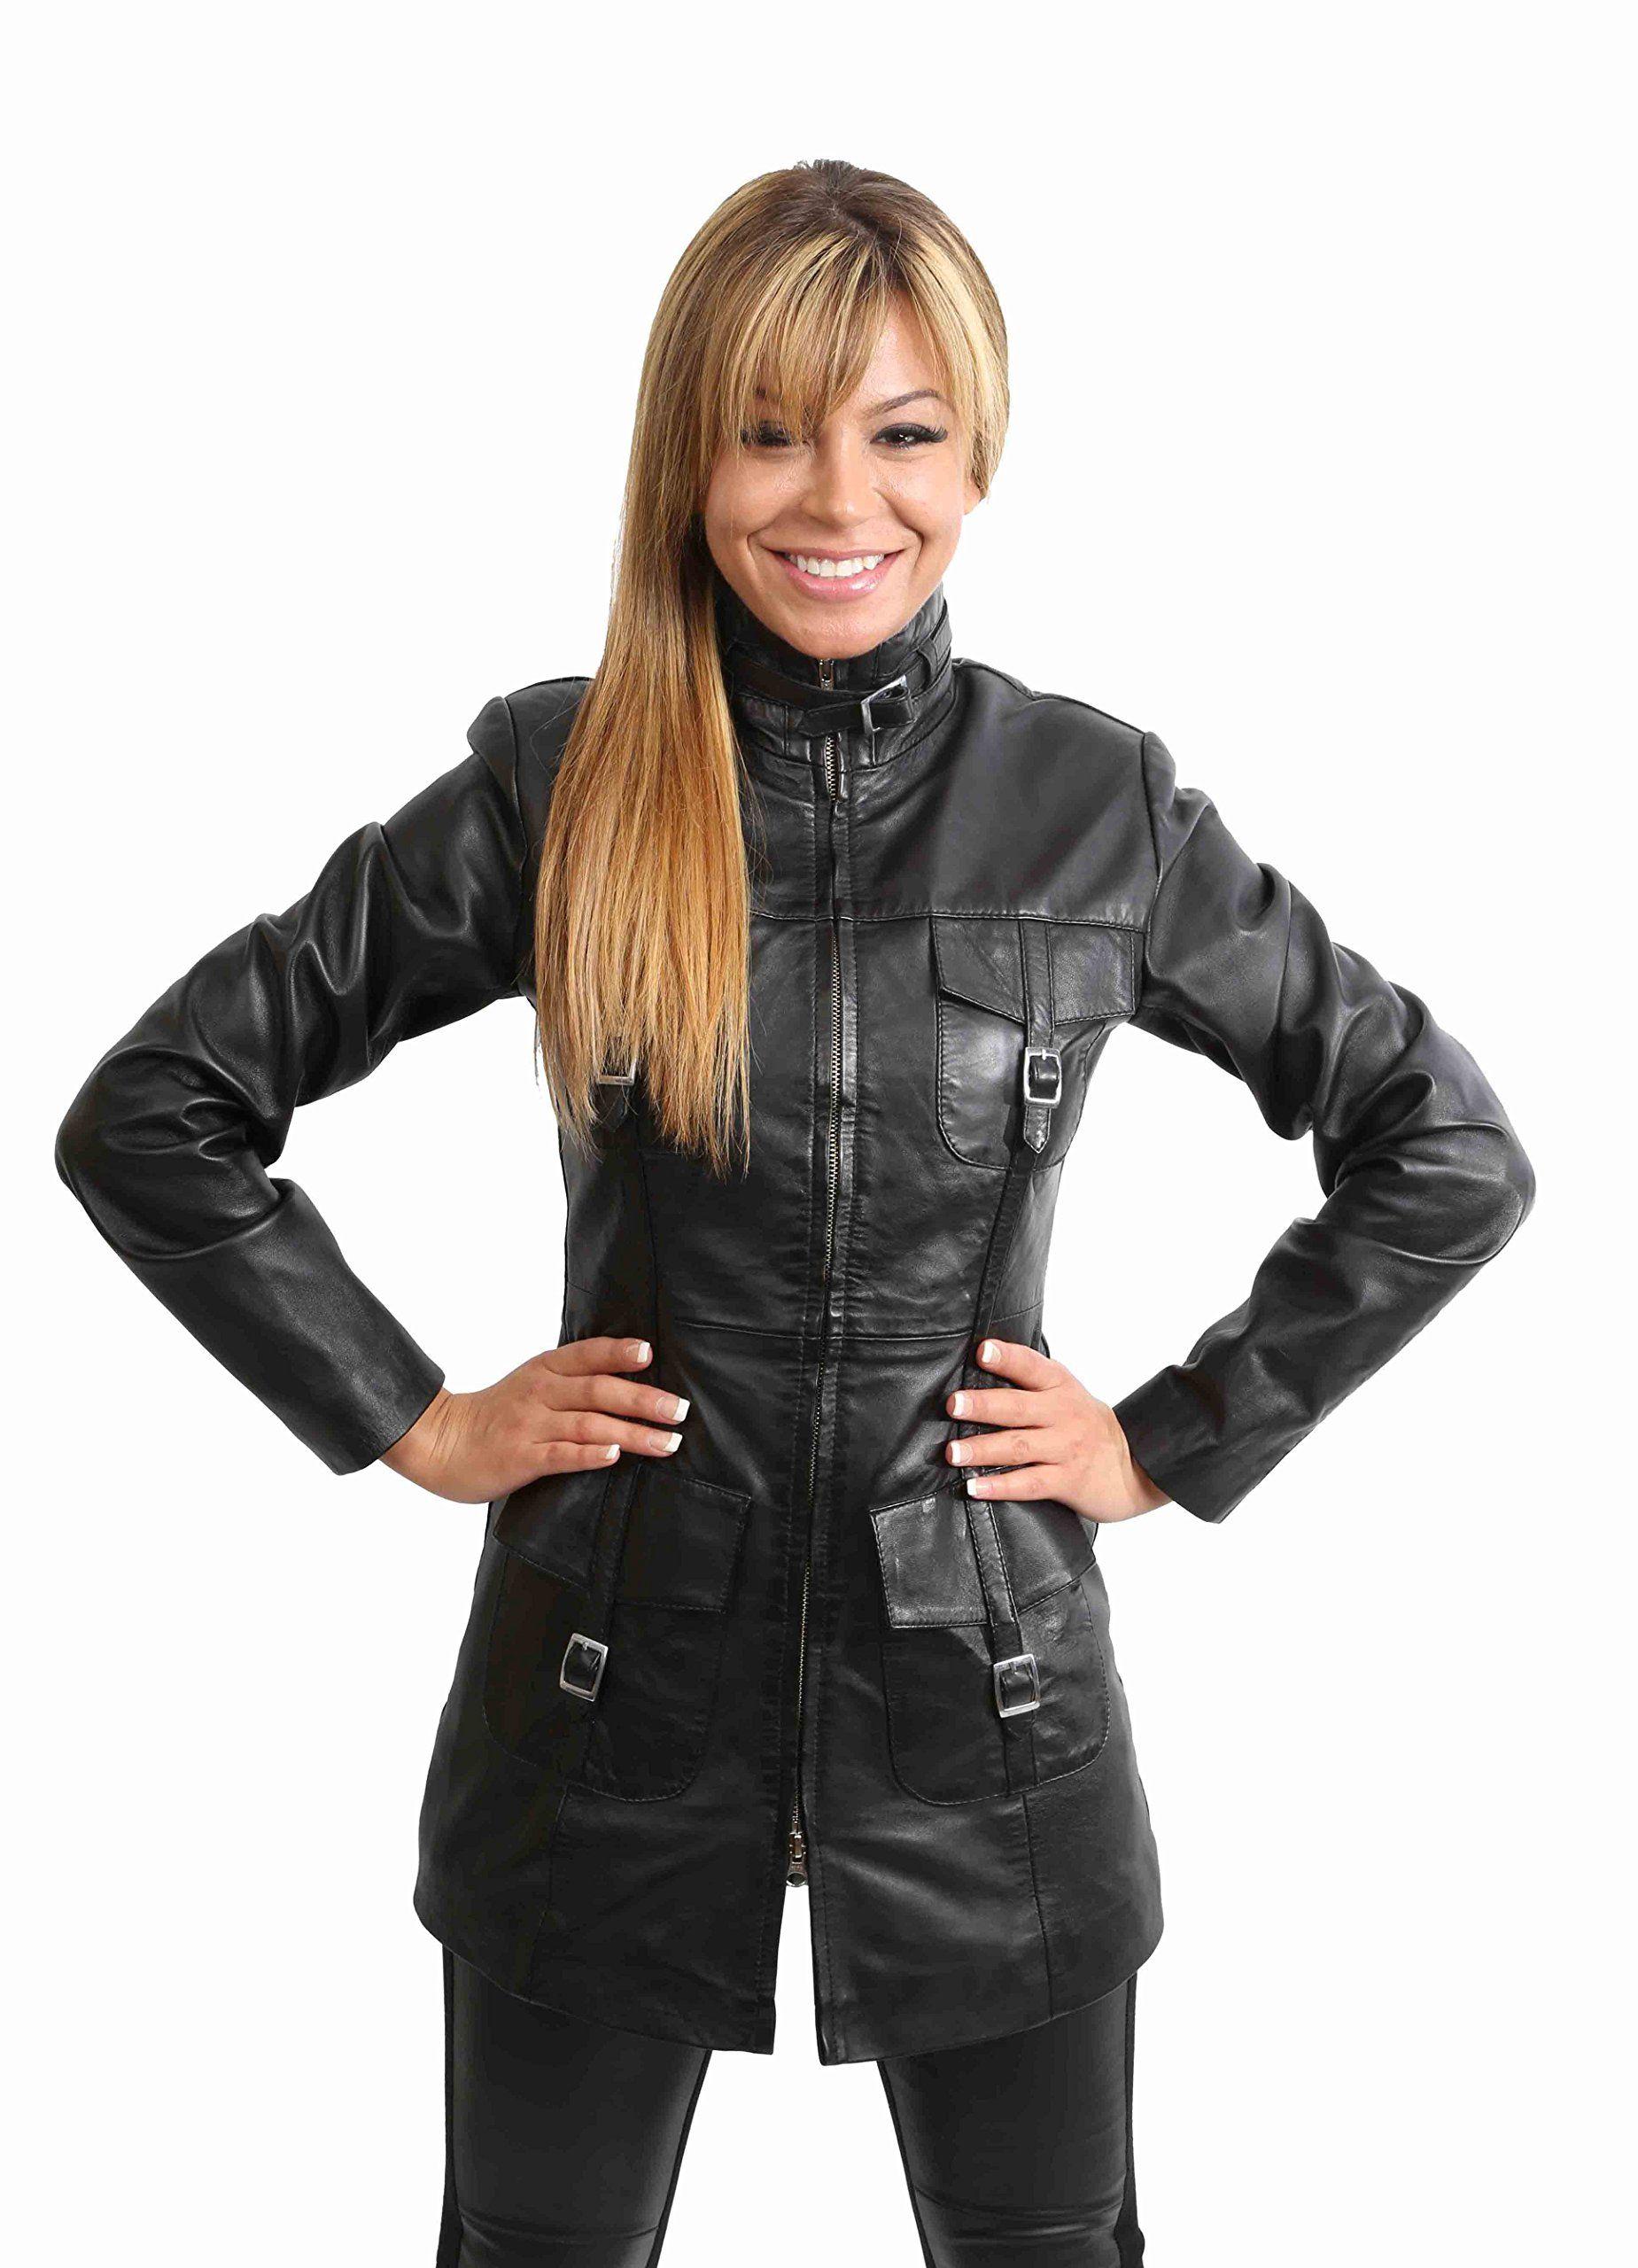 save off 24975 b7023 Damen lange Ledermantel Jacke für Damen 1310 Schwarz: Amazon ...